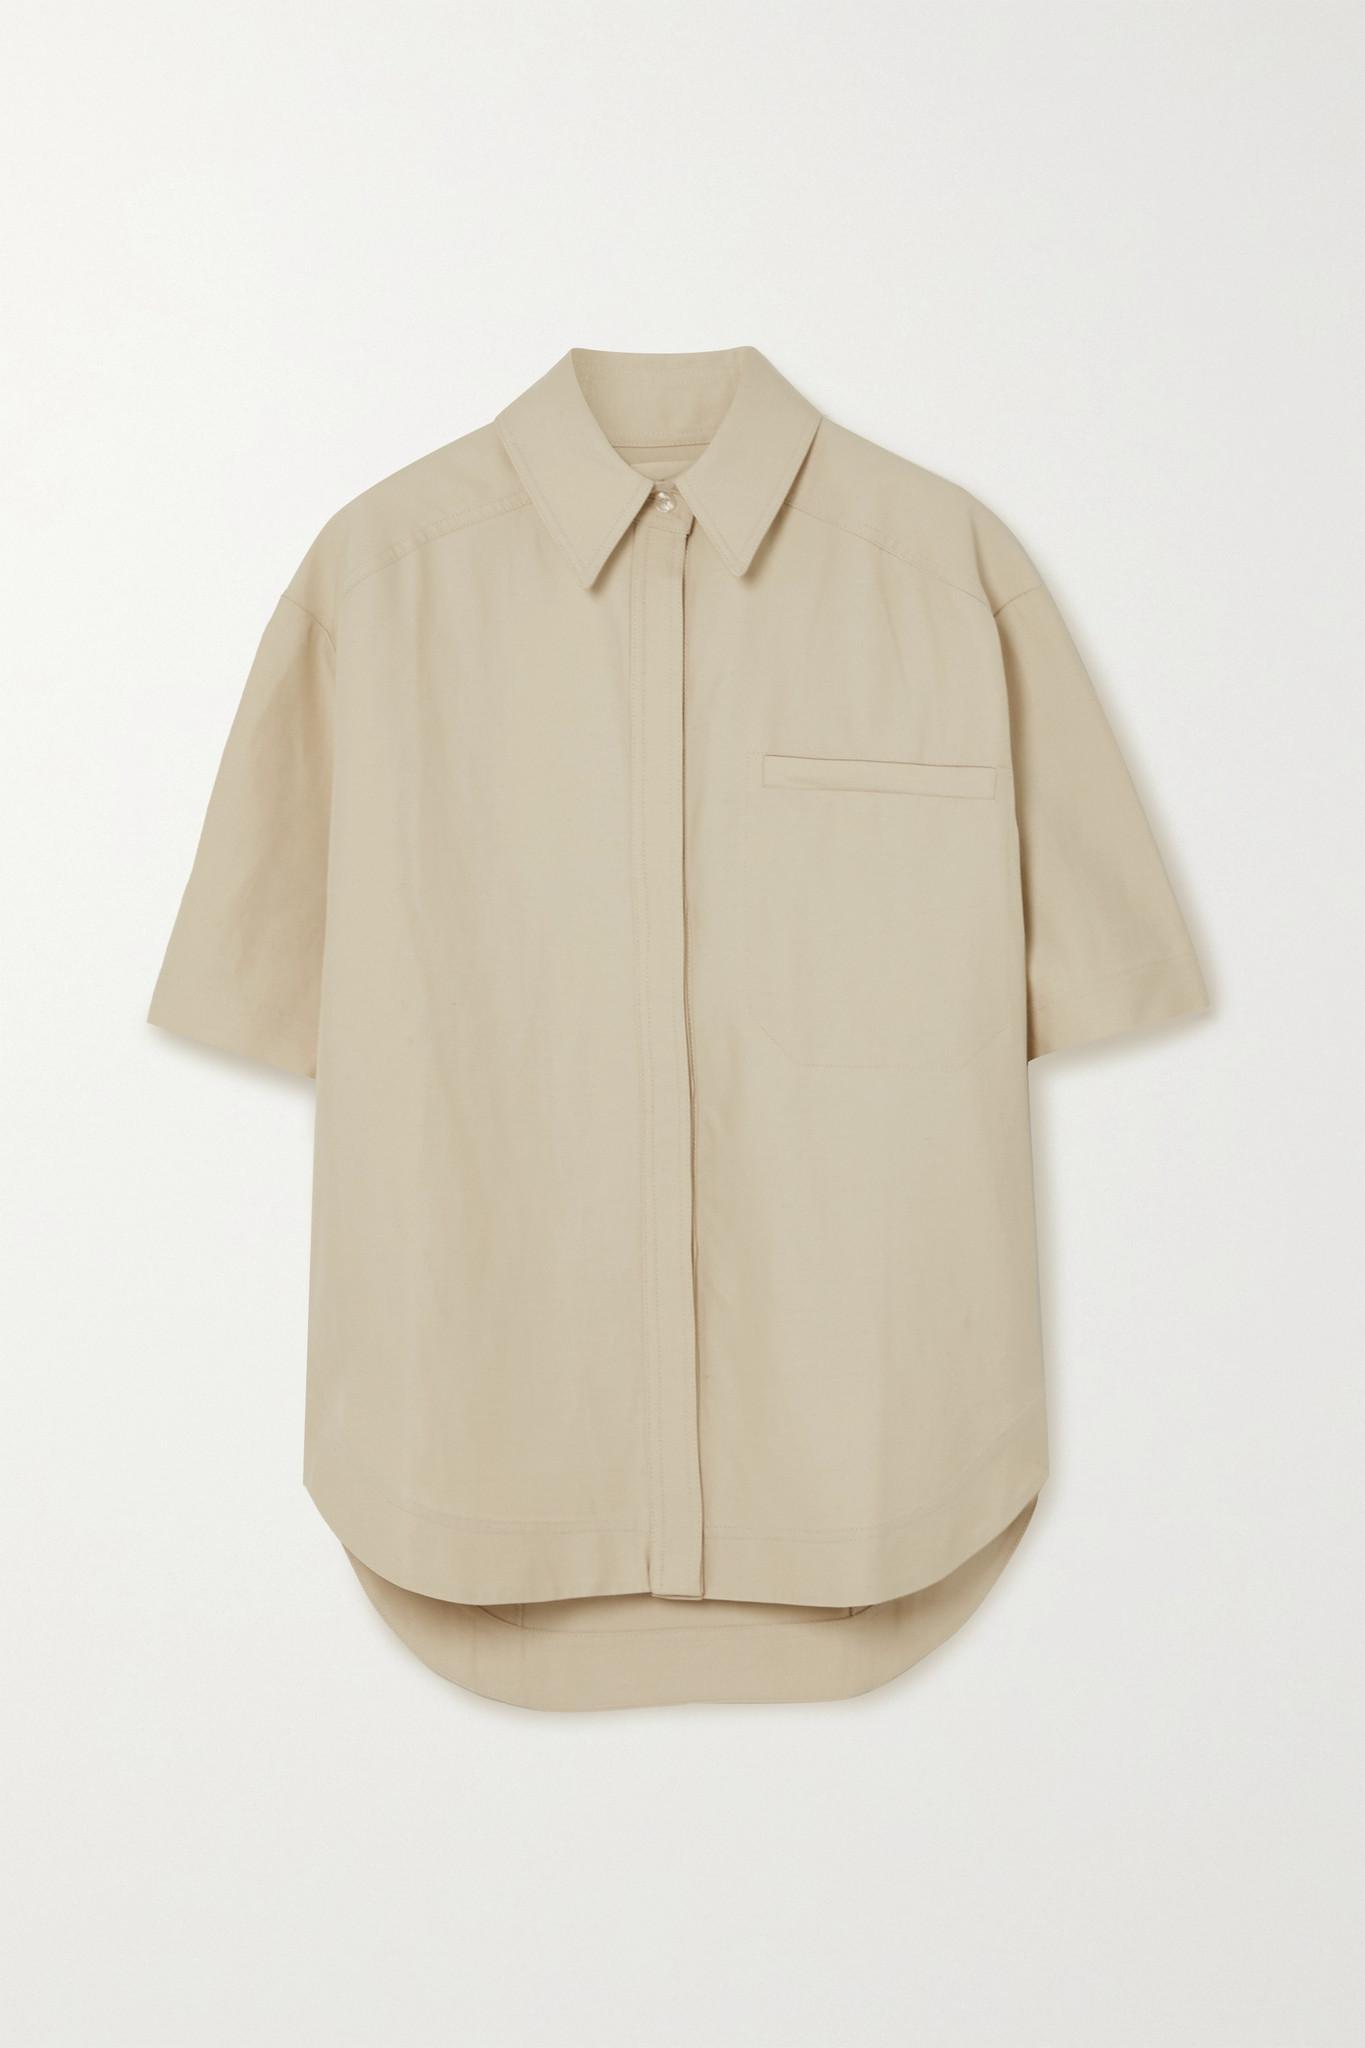 LOULOU STUDIO - Moheli 梭织衬衫 - 中性色 - large